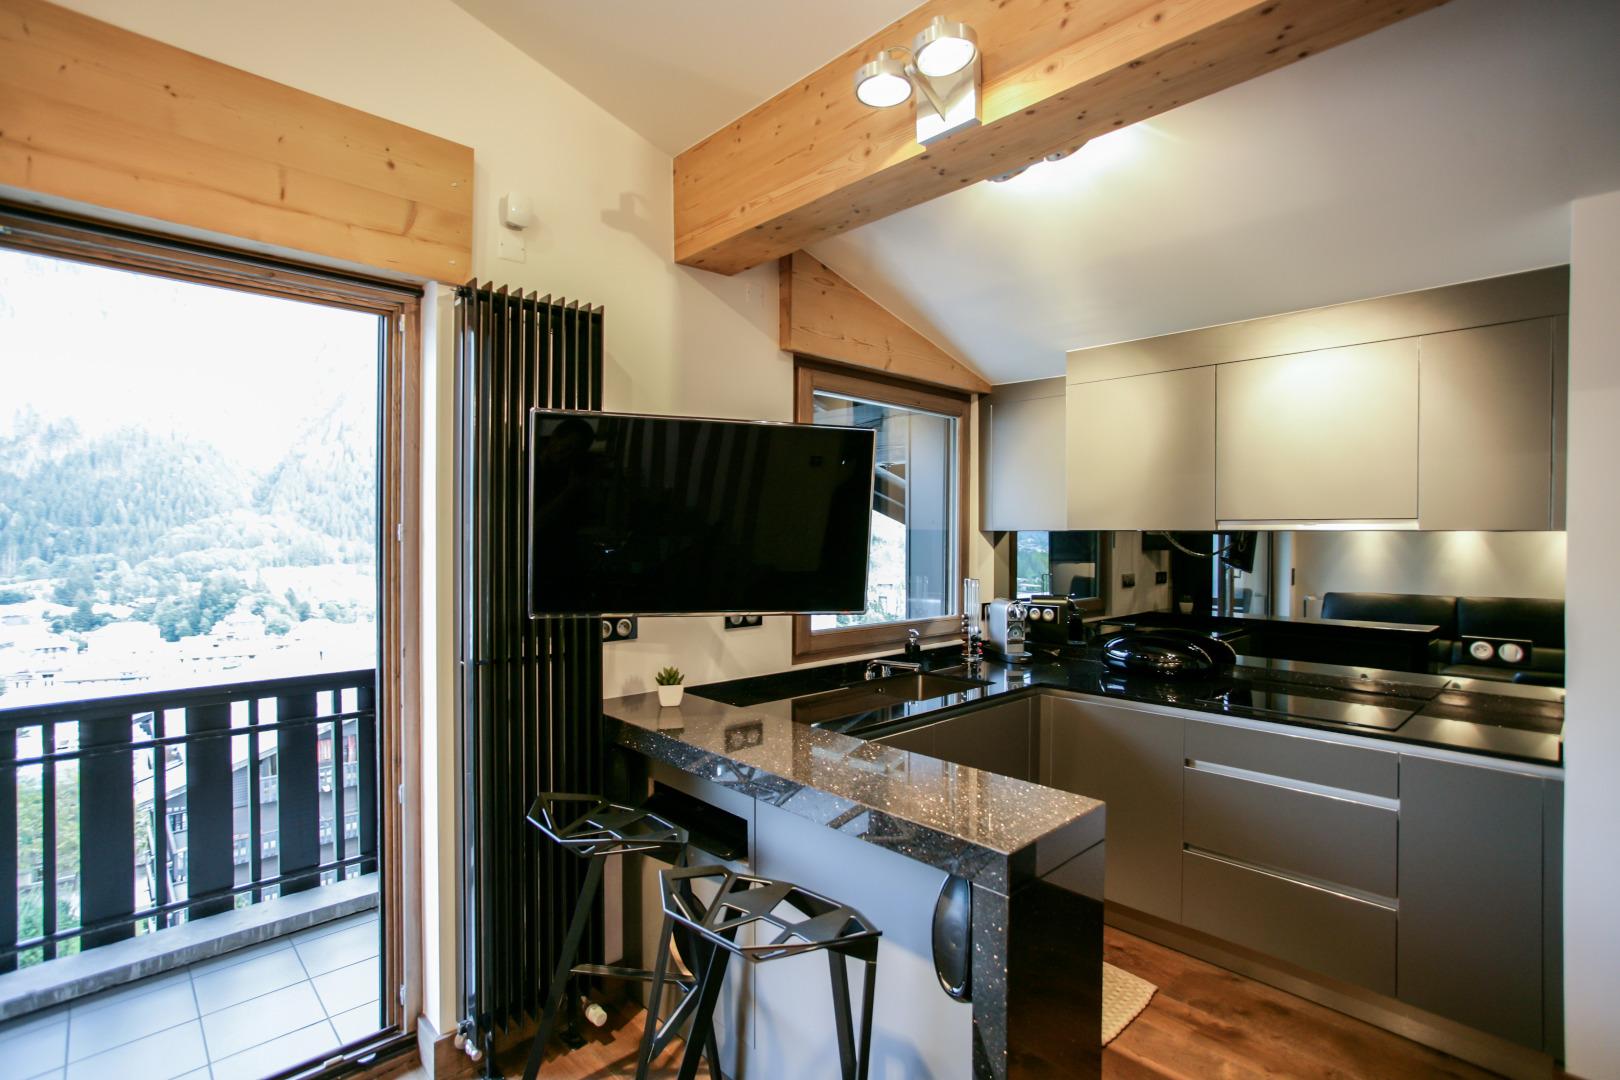 atria chevallier architectes. Black Bedroom Furniture Sets. Home Design Ideas